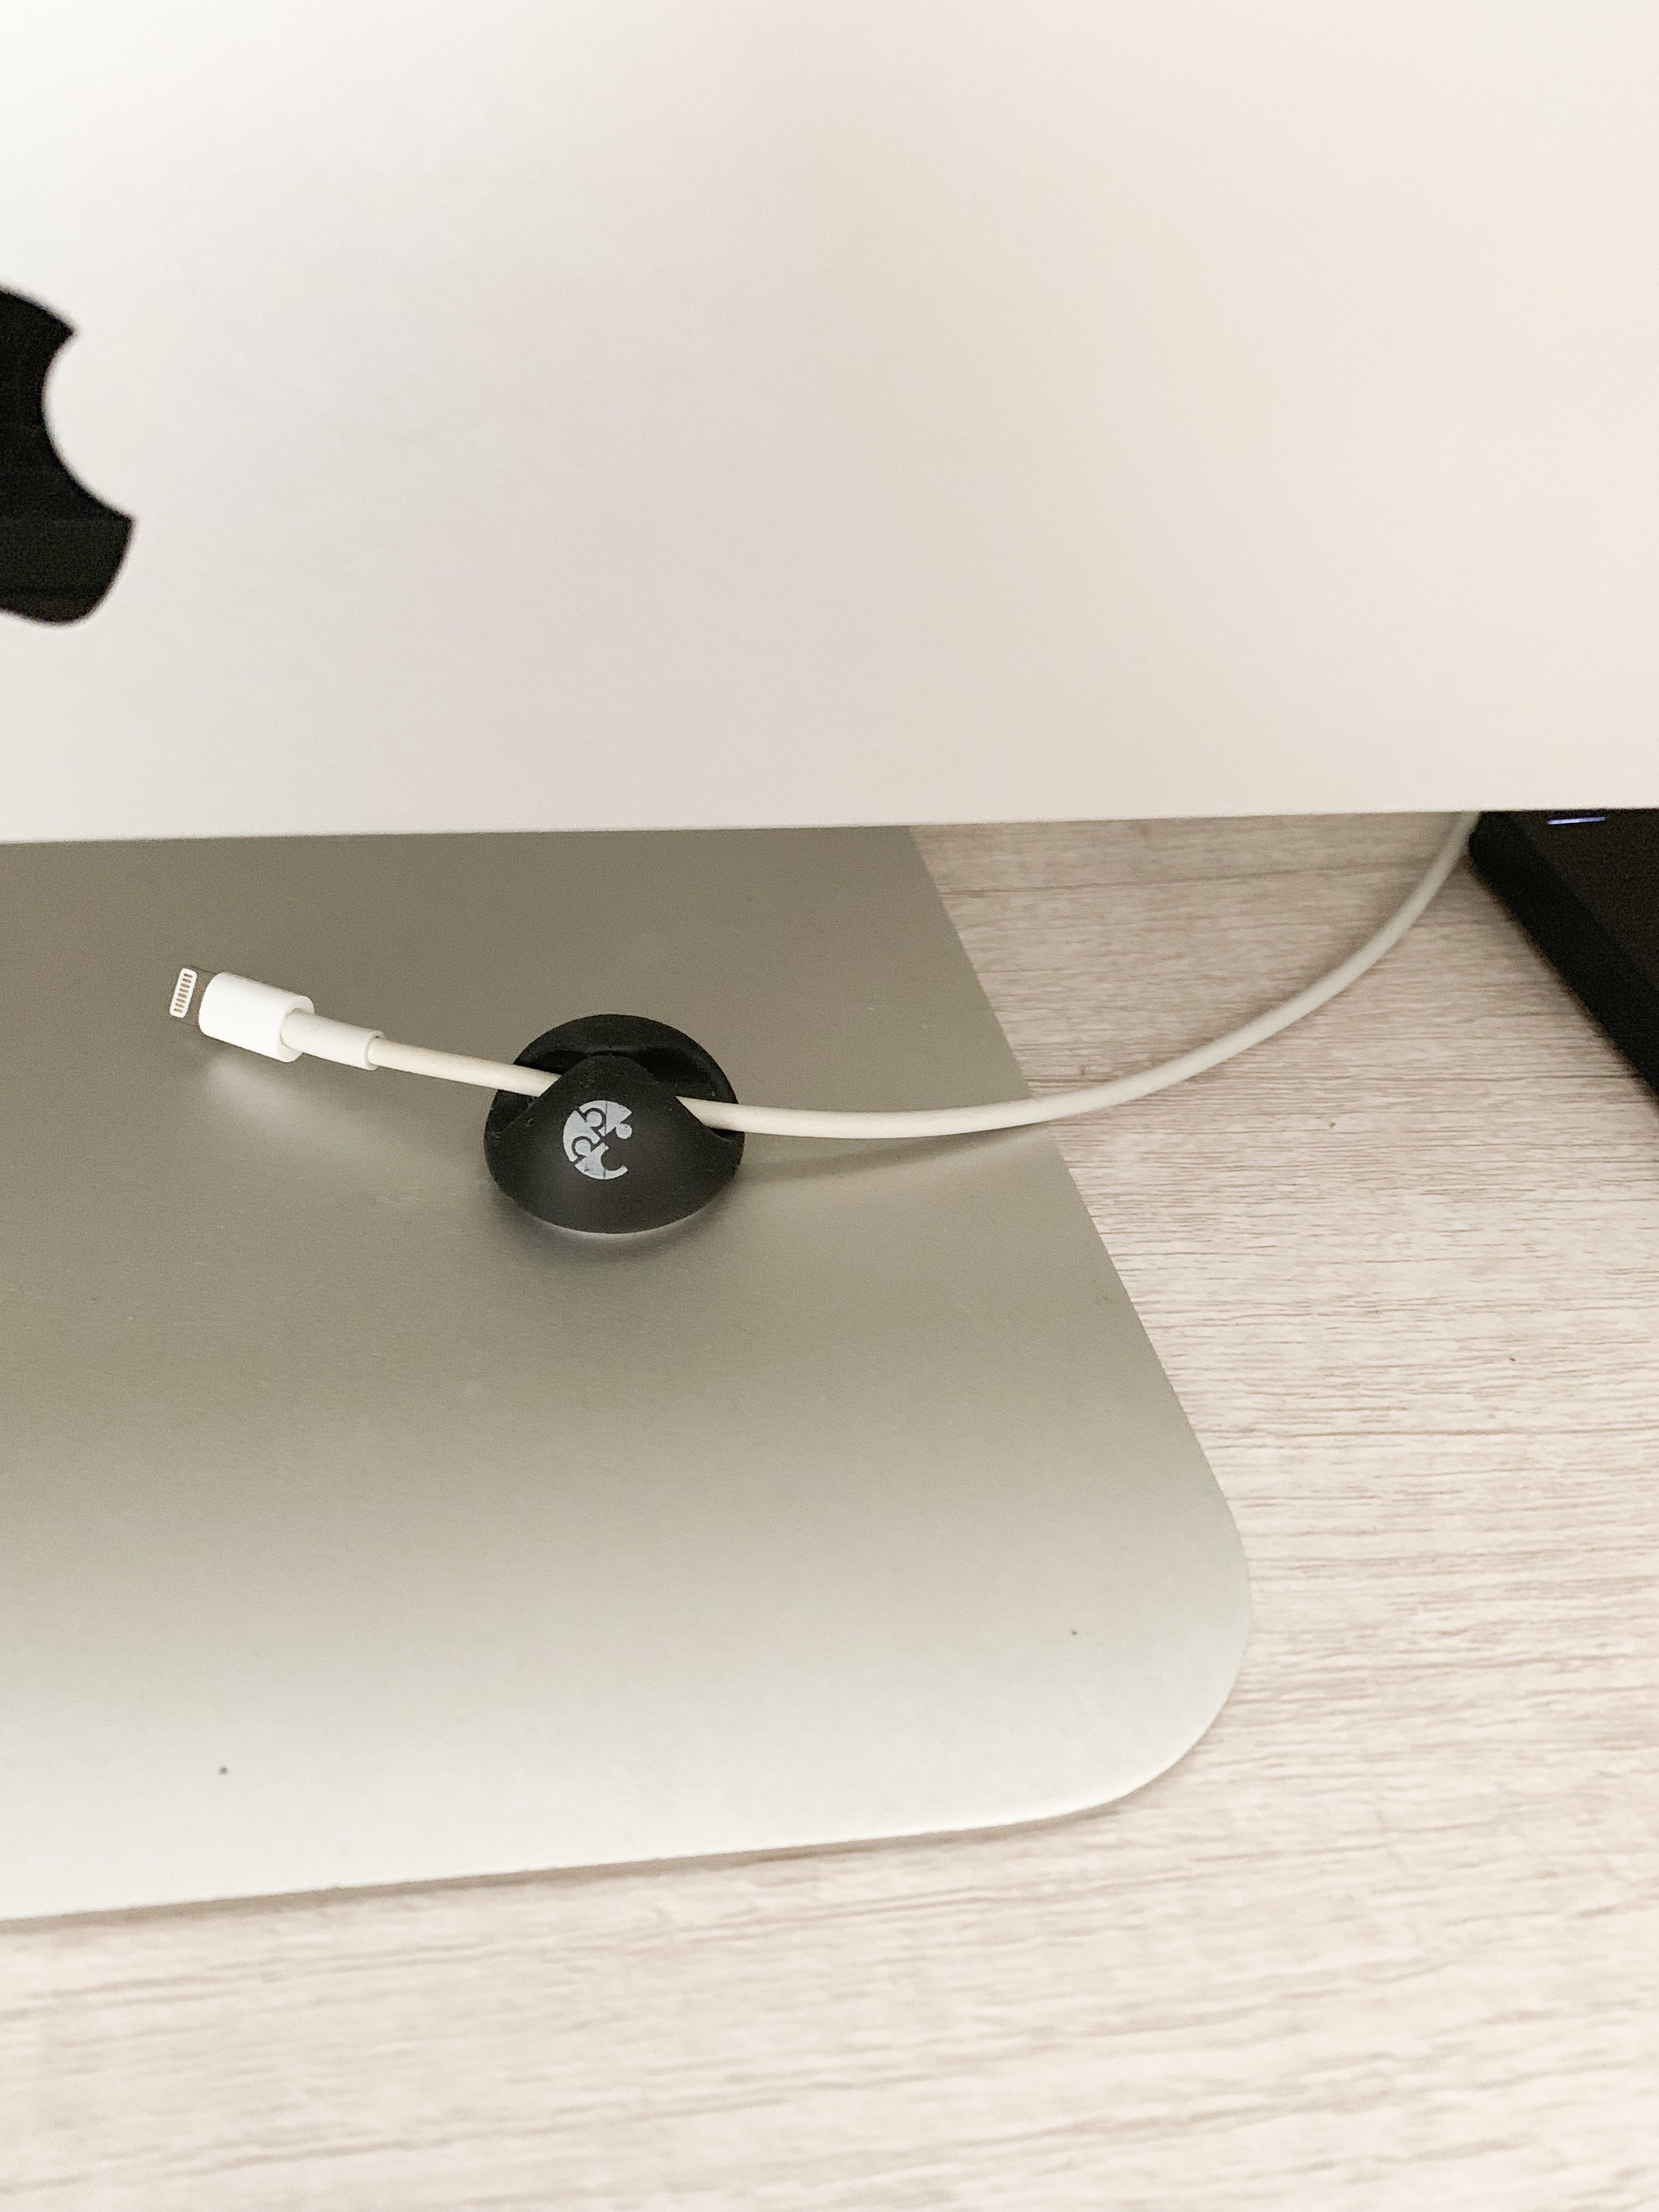 cable-clip-organizer-yanitza-ninett-orlando-photographer-3.JPG